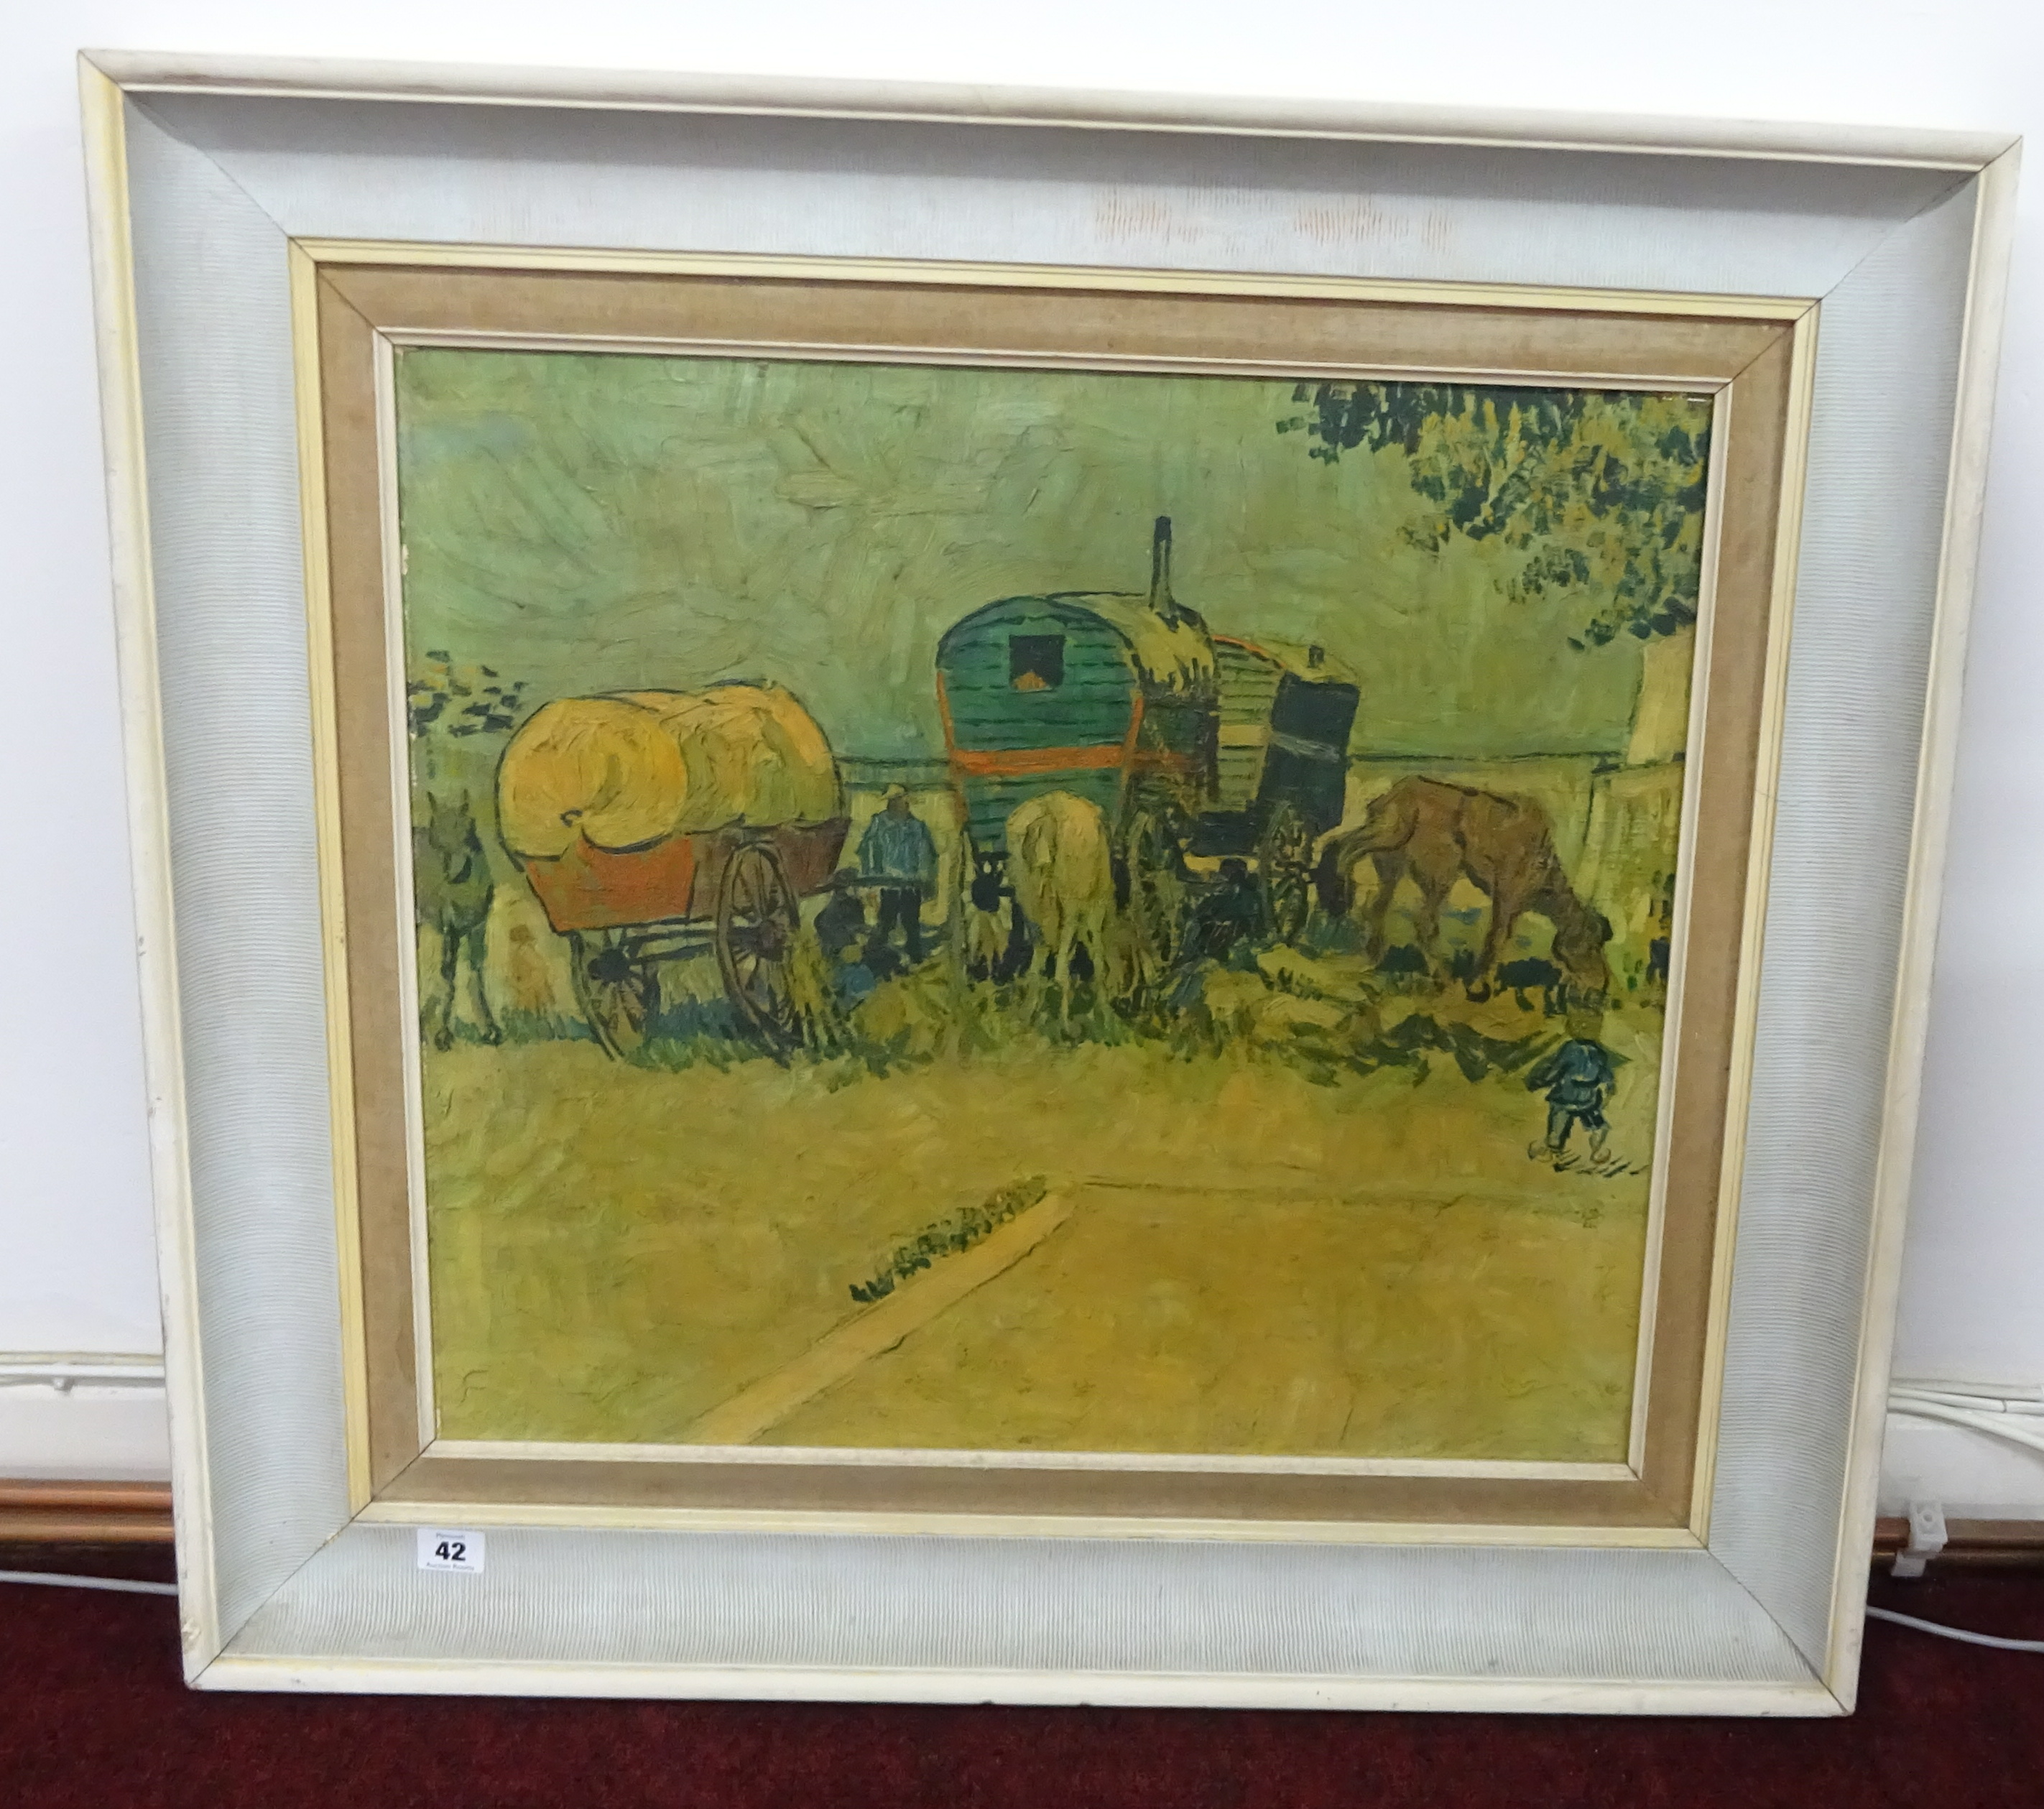 Lot 042 - Gypsy Caravan, oil on canvas, 49cm x 55cm.